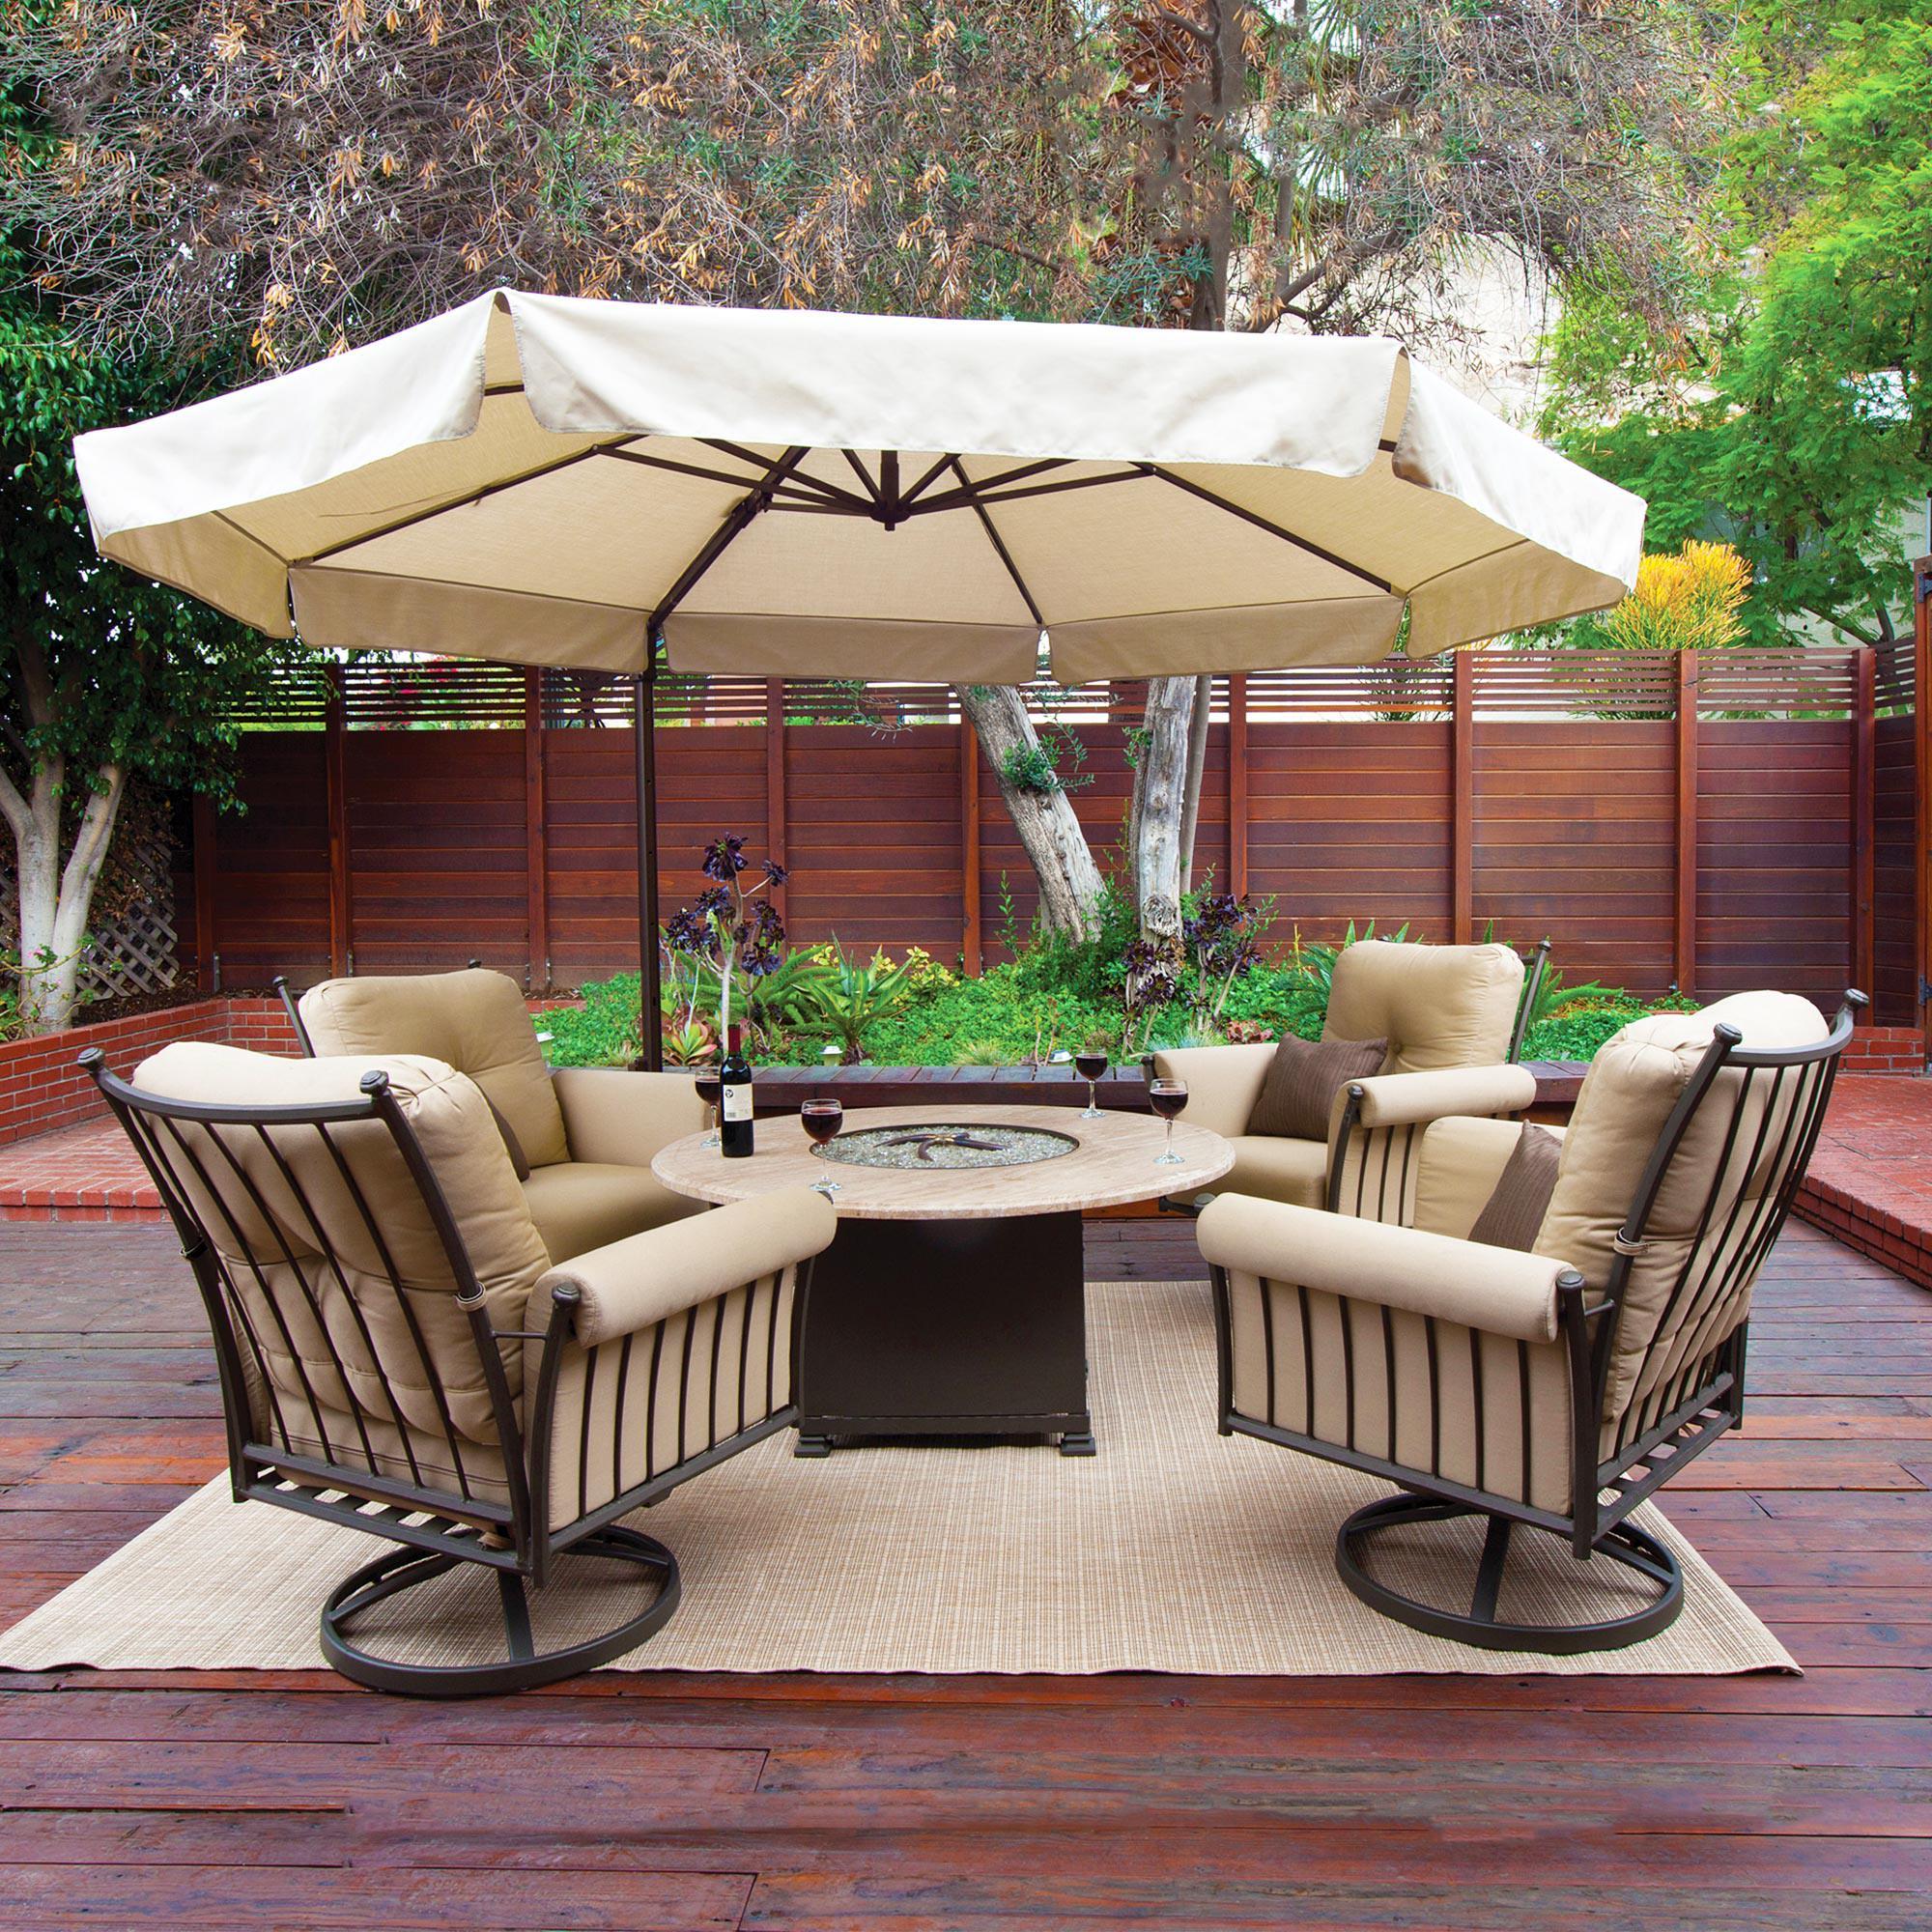 Bali 11 Ft Octagon Solefin Cantilever Umbrella With